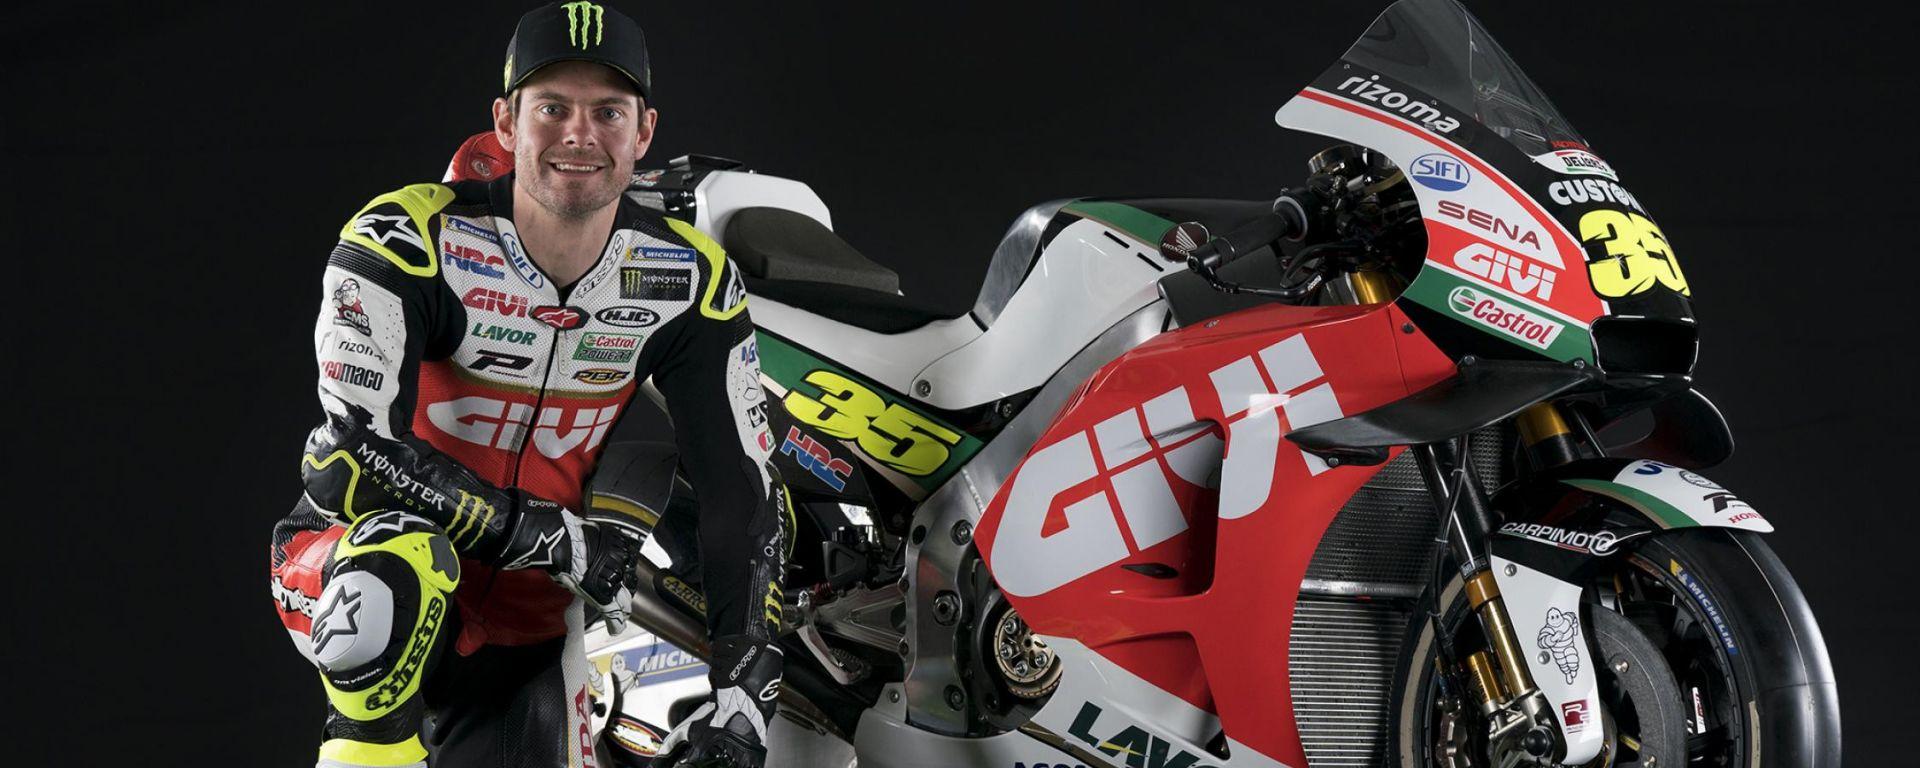 MotoGP 2019, Cal Crutchlow - LCR Honda Castrol